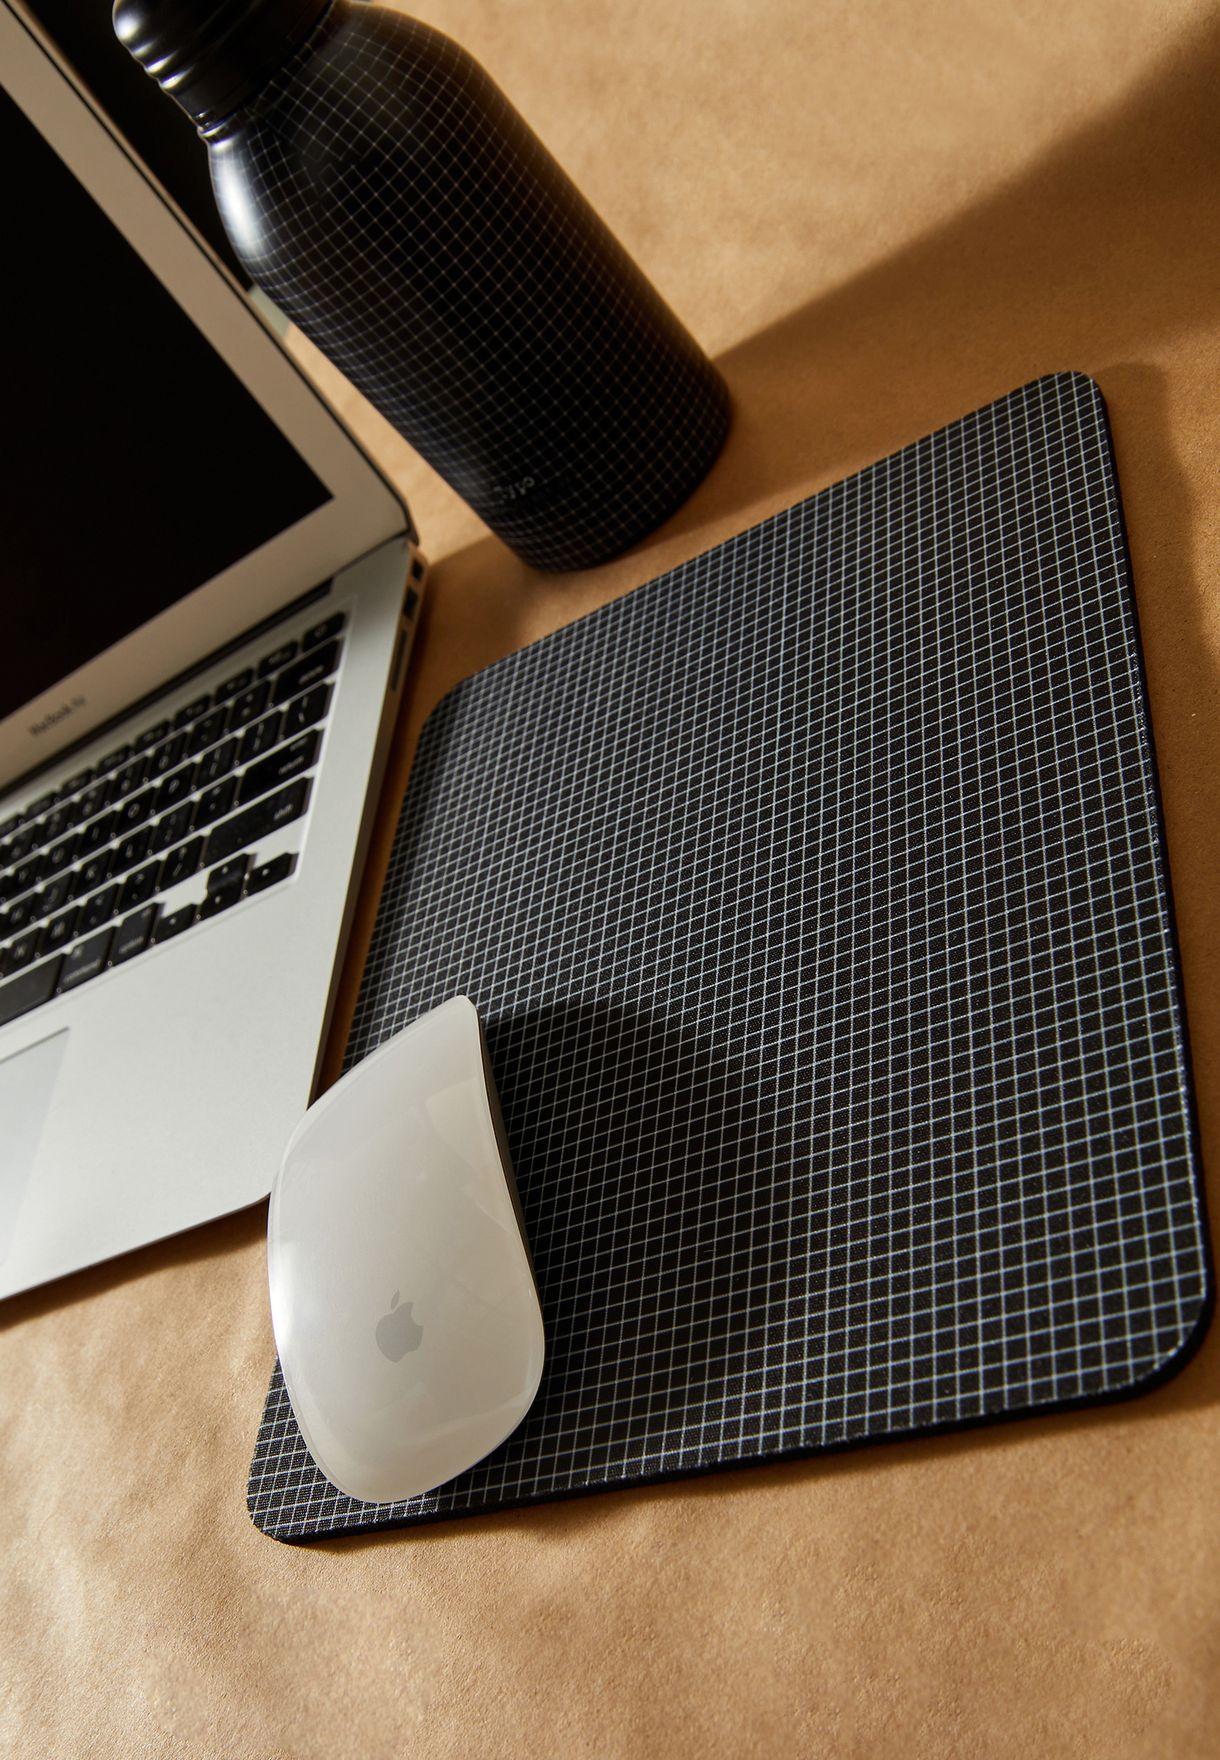 Neoprene Mouse Pad